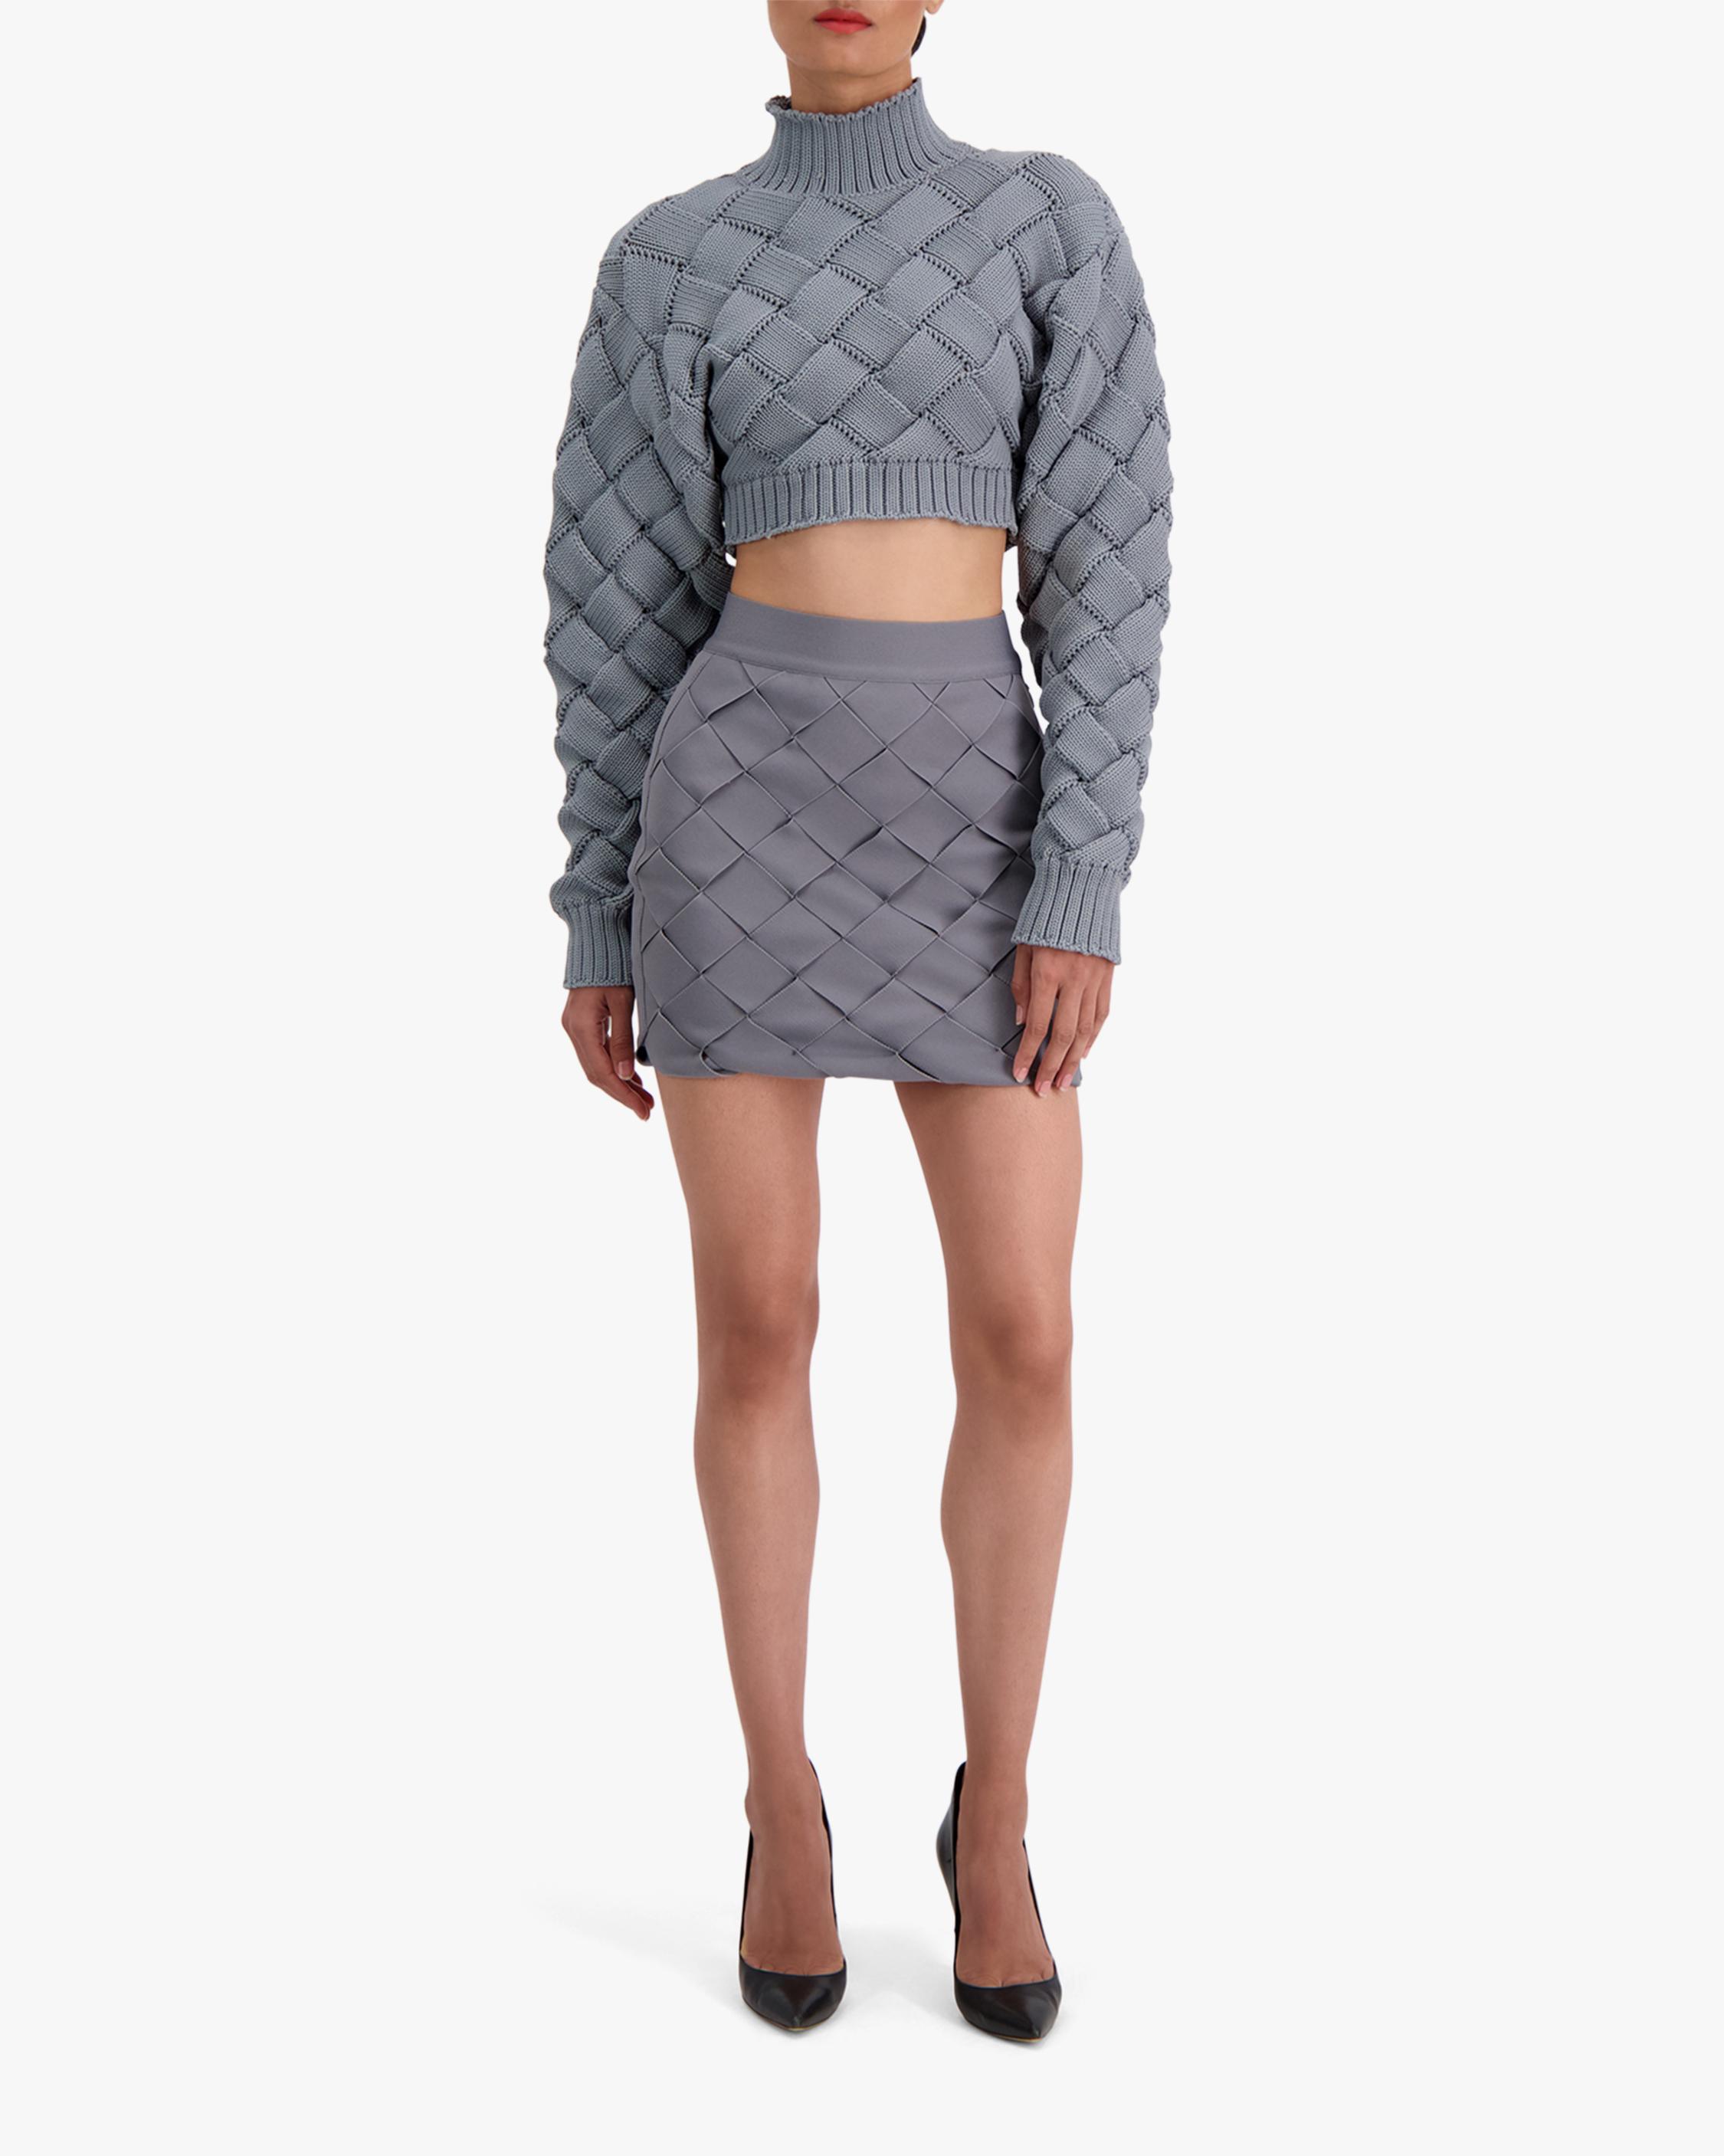 Herve Leger Bandage Weave Mini Skirt 2